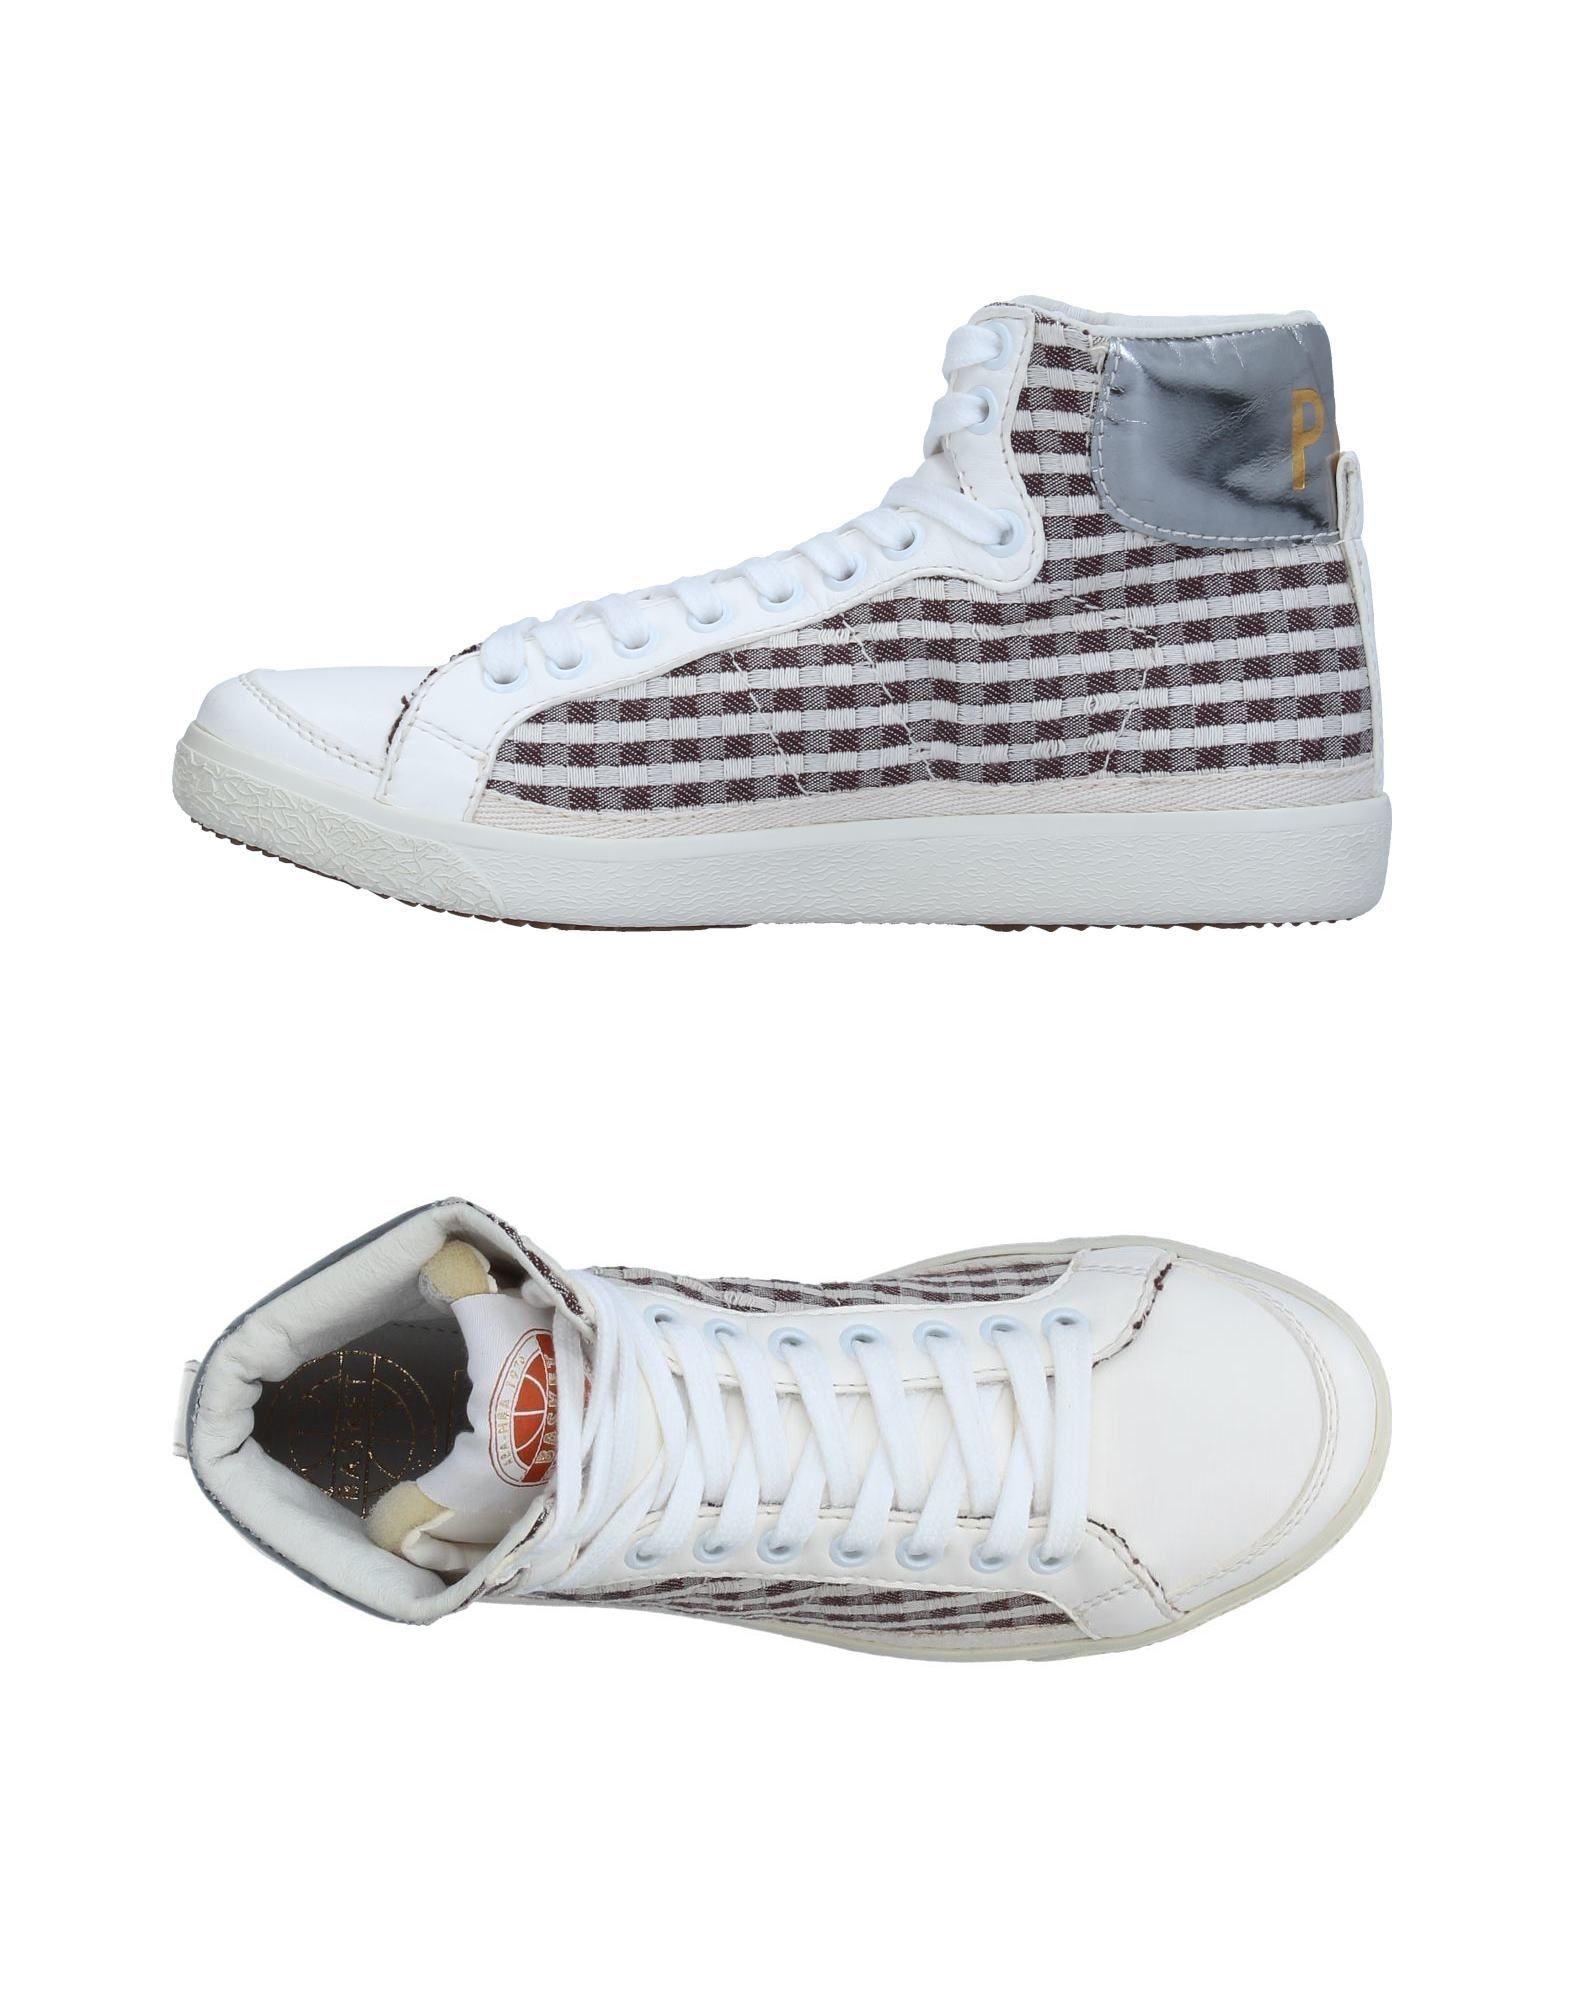 Pantofola D'oro Sneakers Damen  11339672IW Gute Qualität beliebte Schuhe